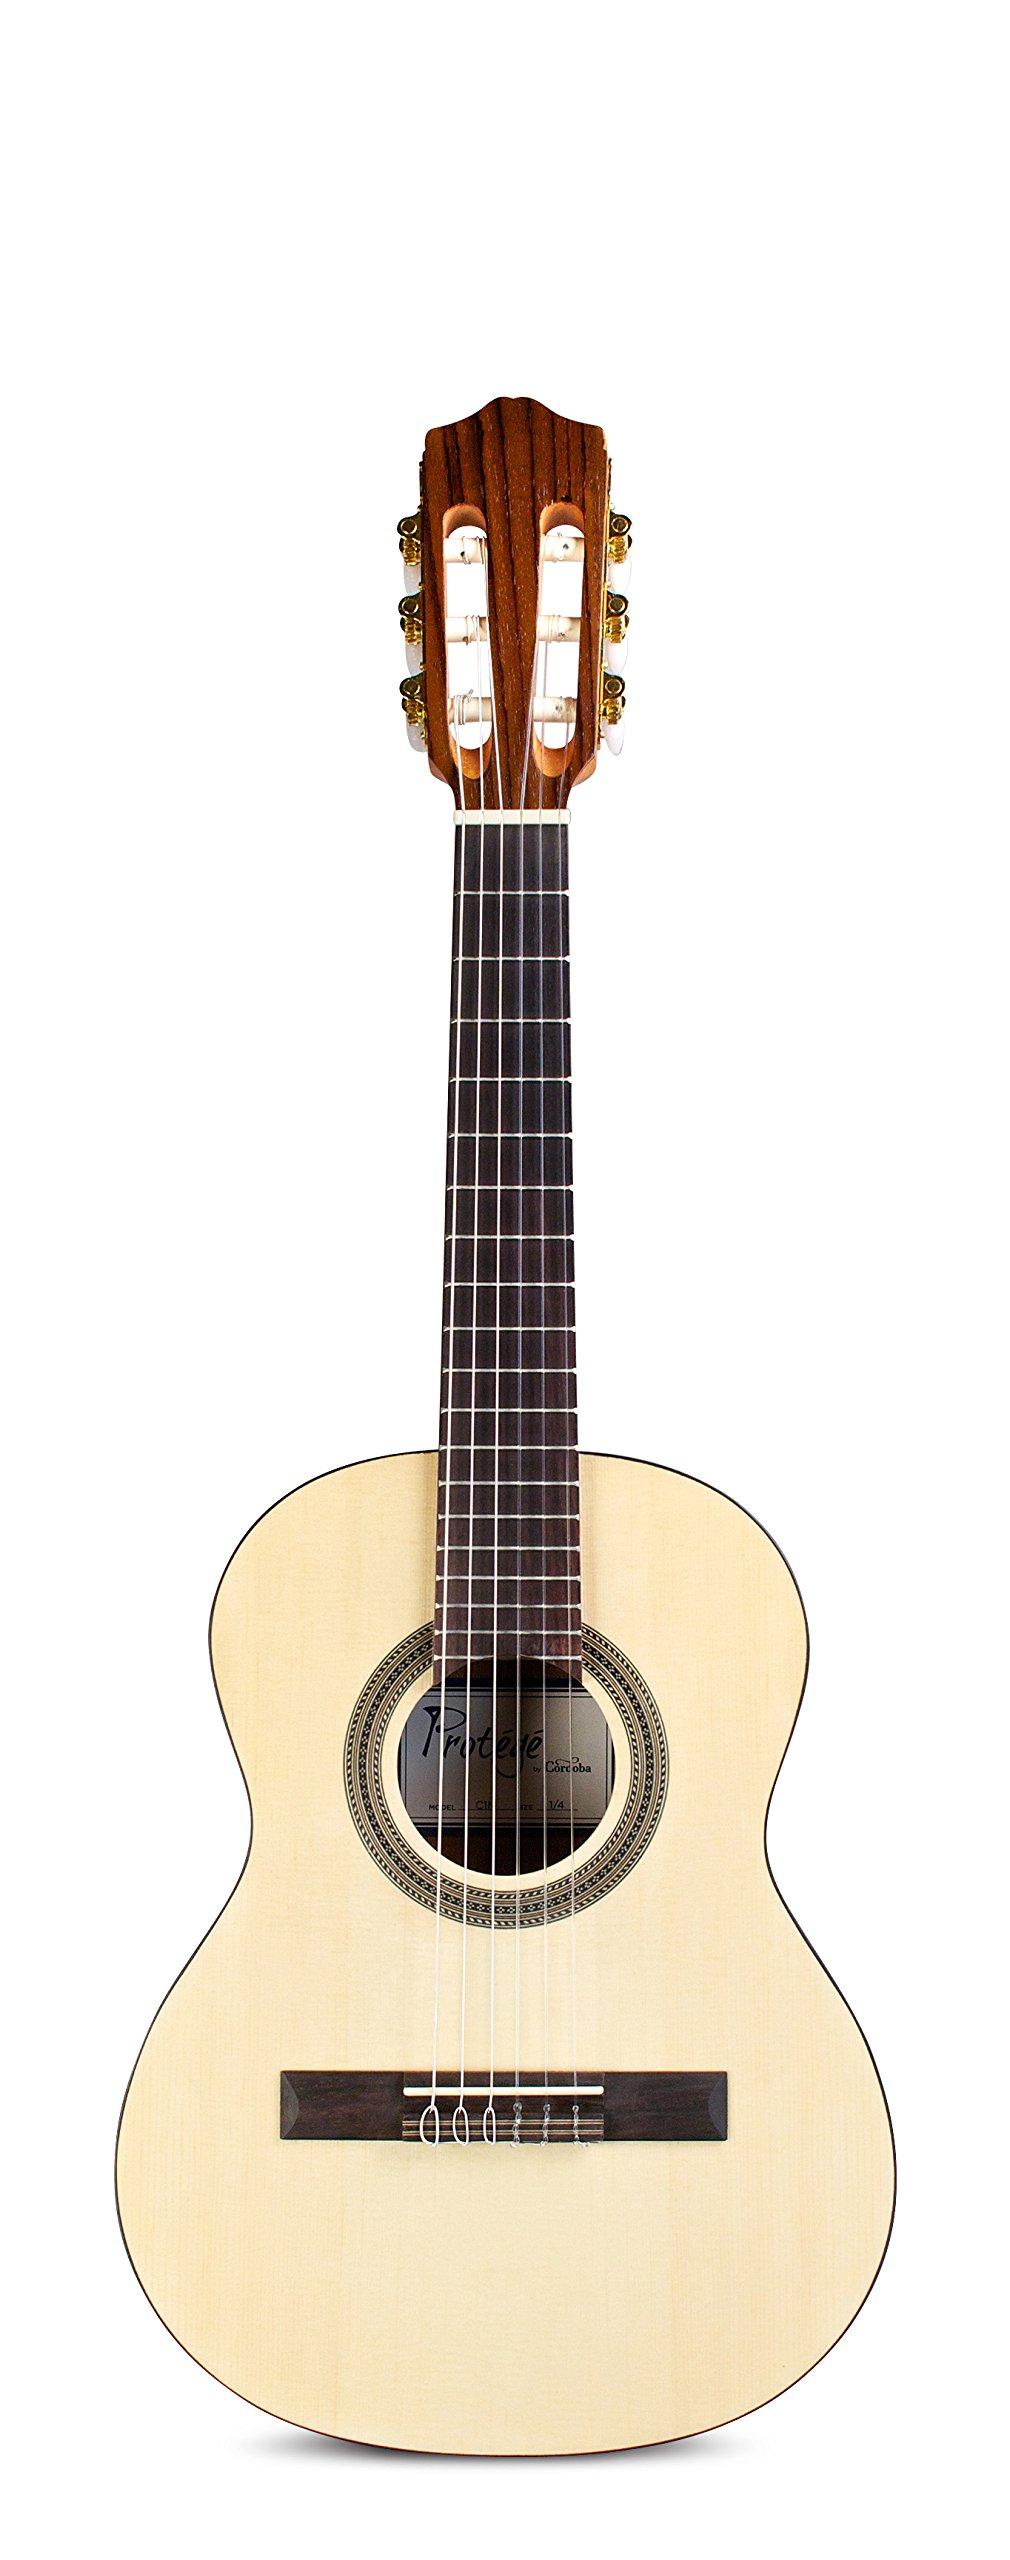 Cordoba Guitars C1M 1/4 Acoustic Nylon String Guitar, 1/4 size